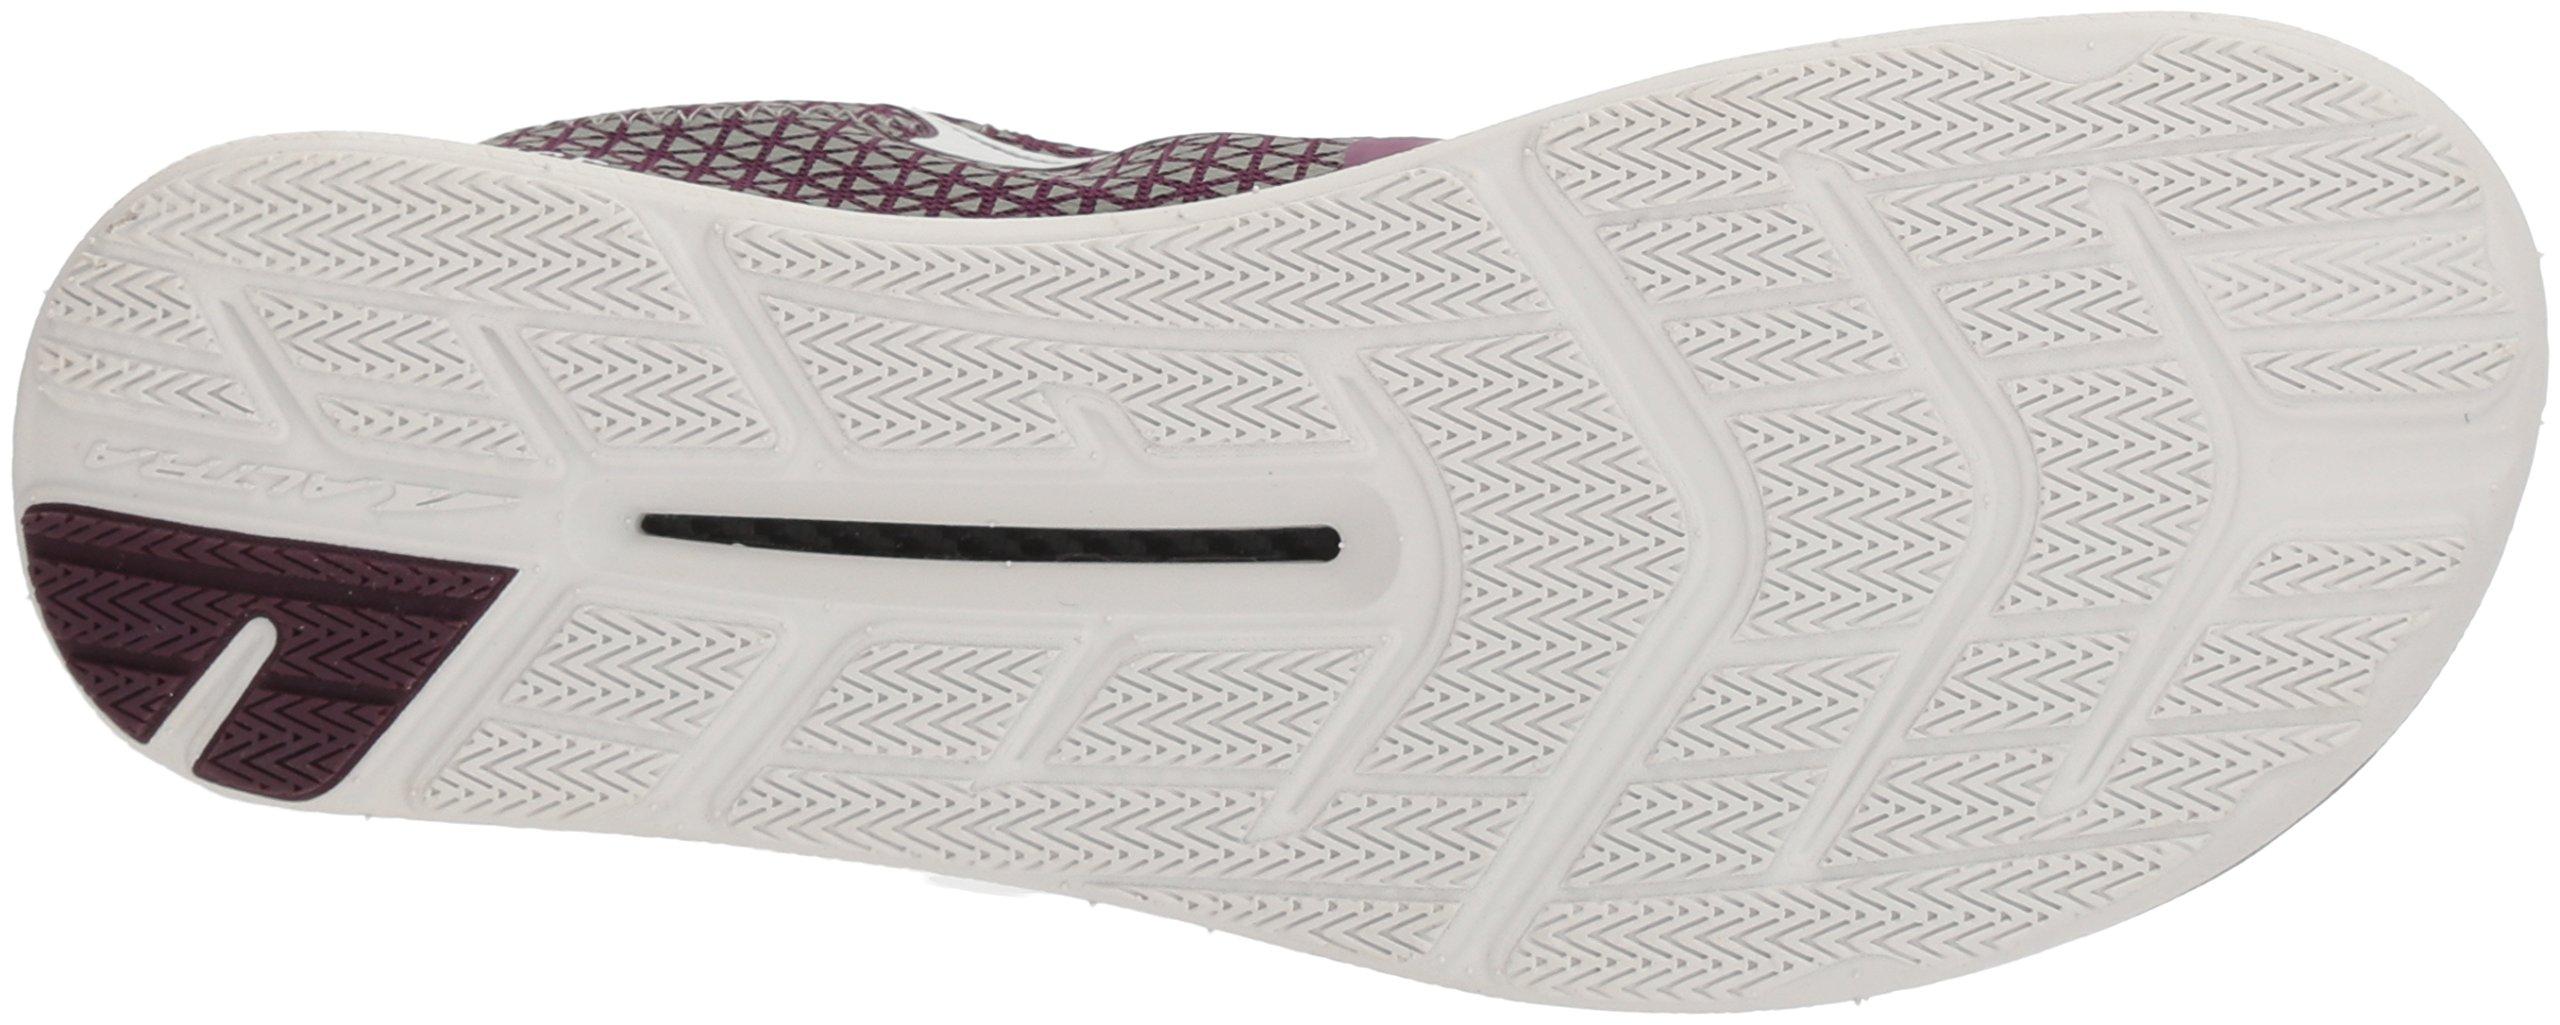 Altra Women's Solstice Sneaker, Purple, 5.5 Regular US by Altra (Image #3)